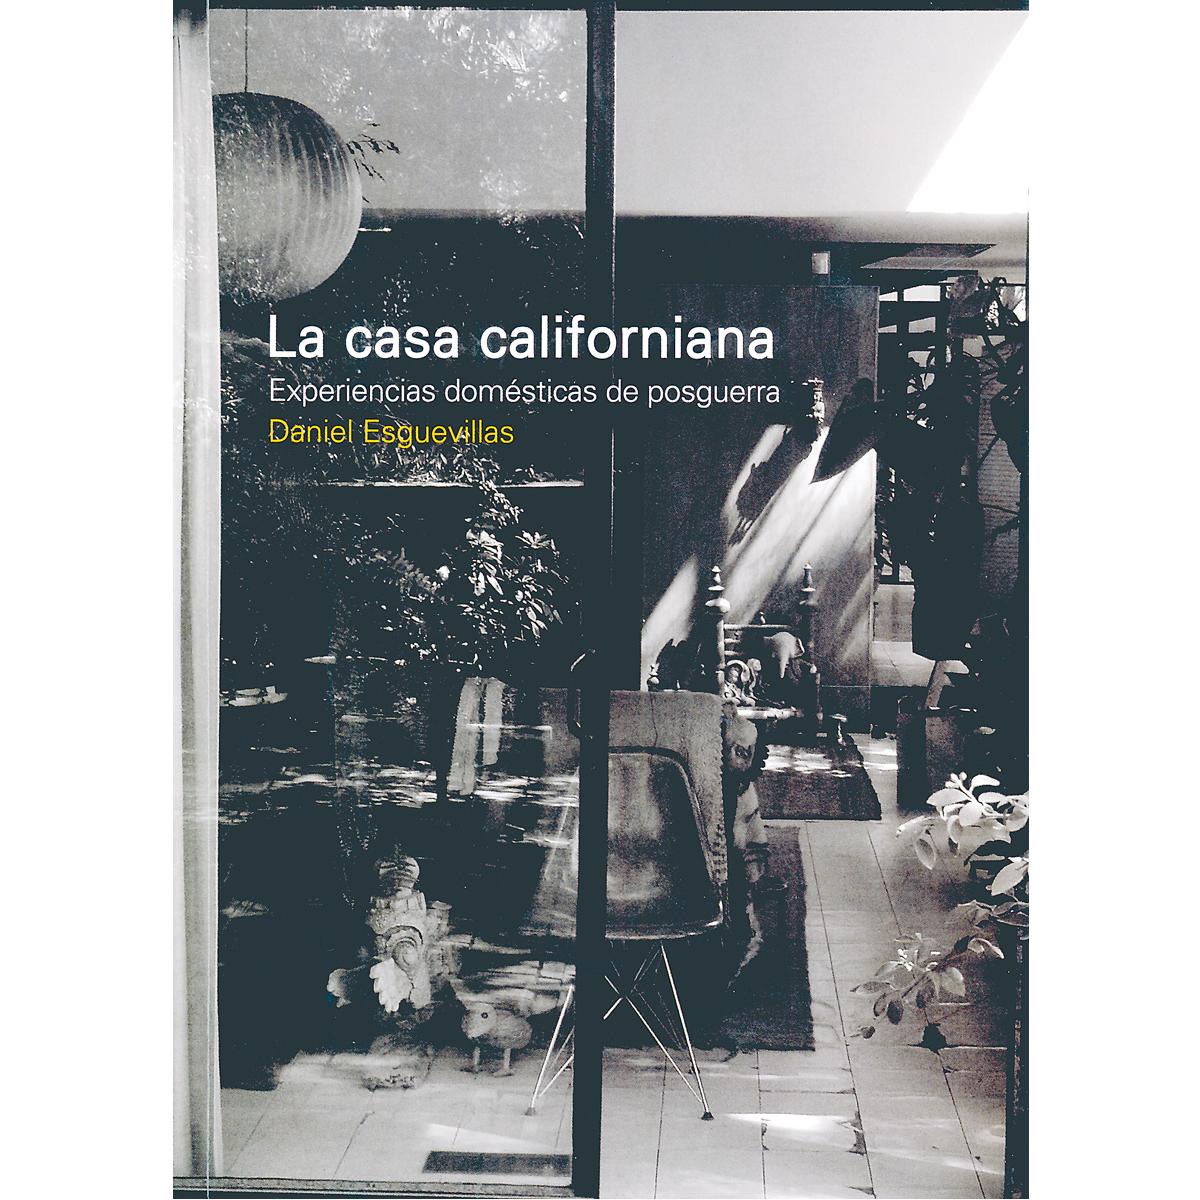 La casa californiana